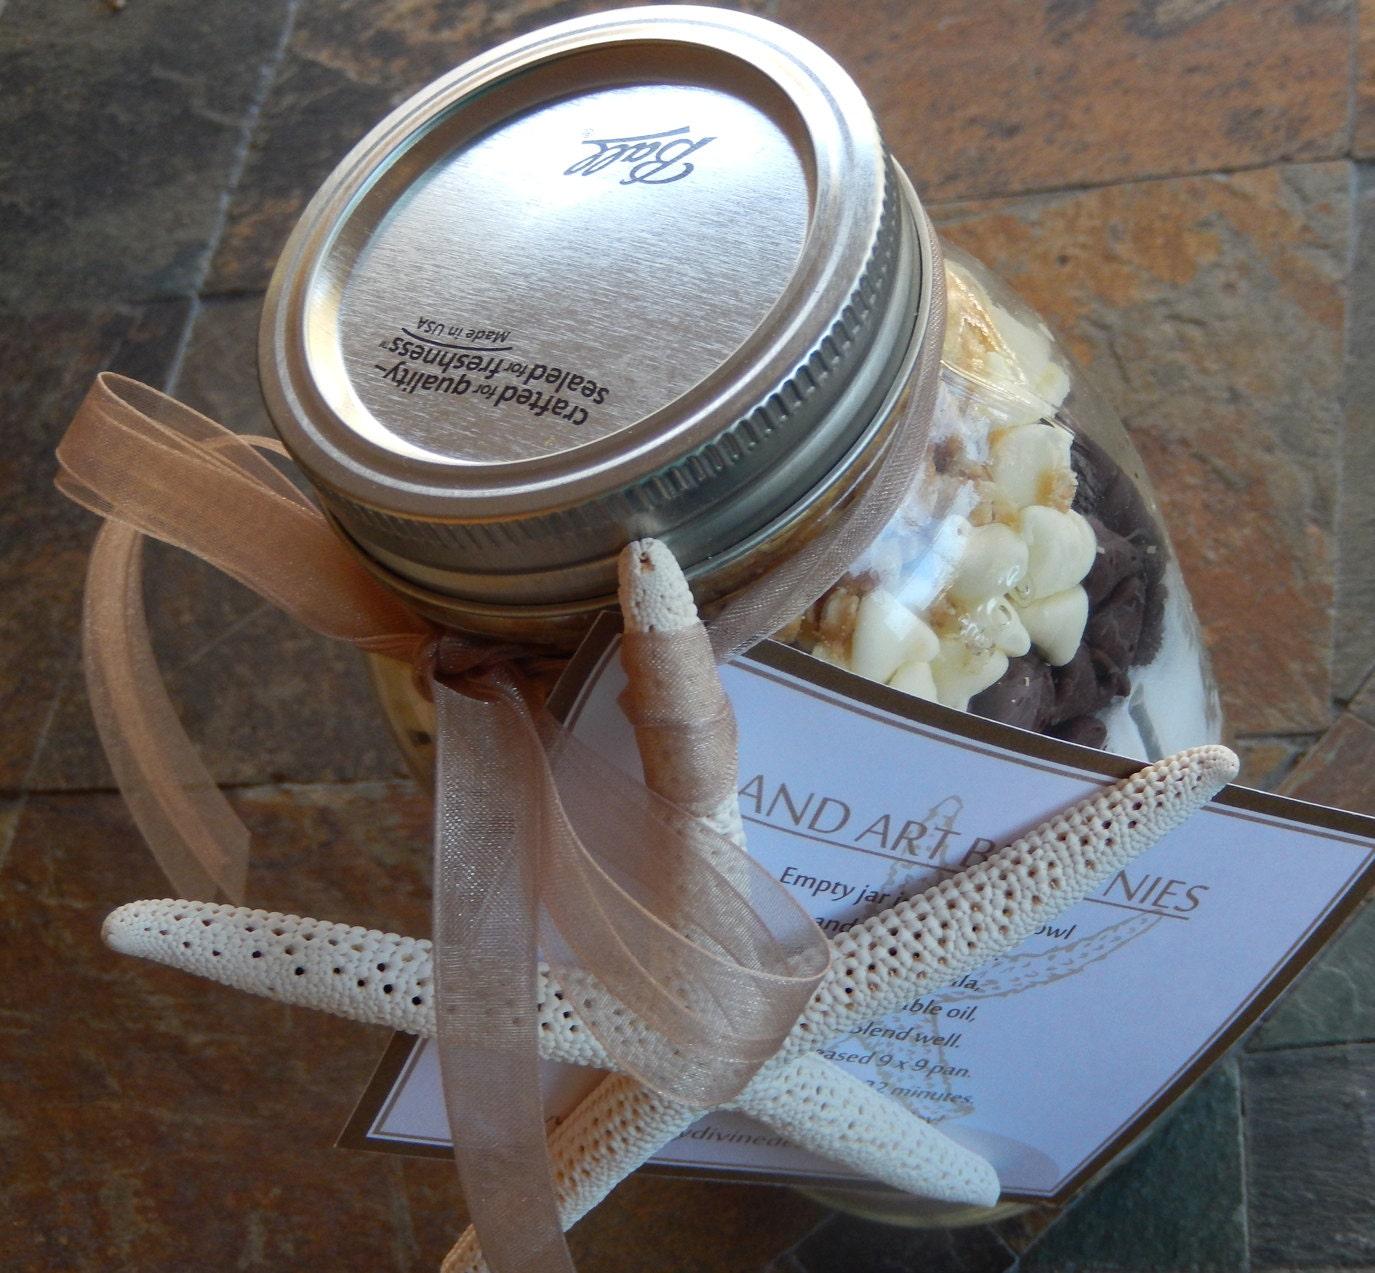 Sand Art Cake Mix : Sand Art Brownies Gourmet Mix in a Ball Mason by ...